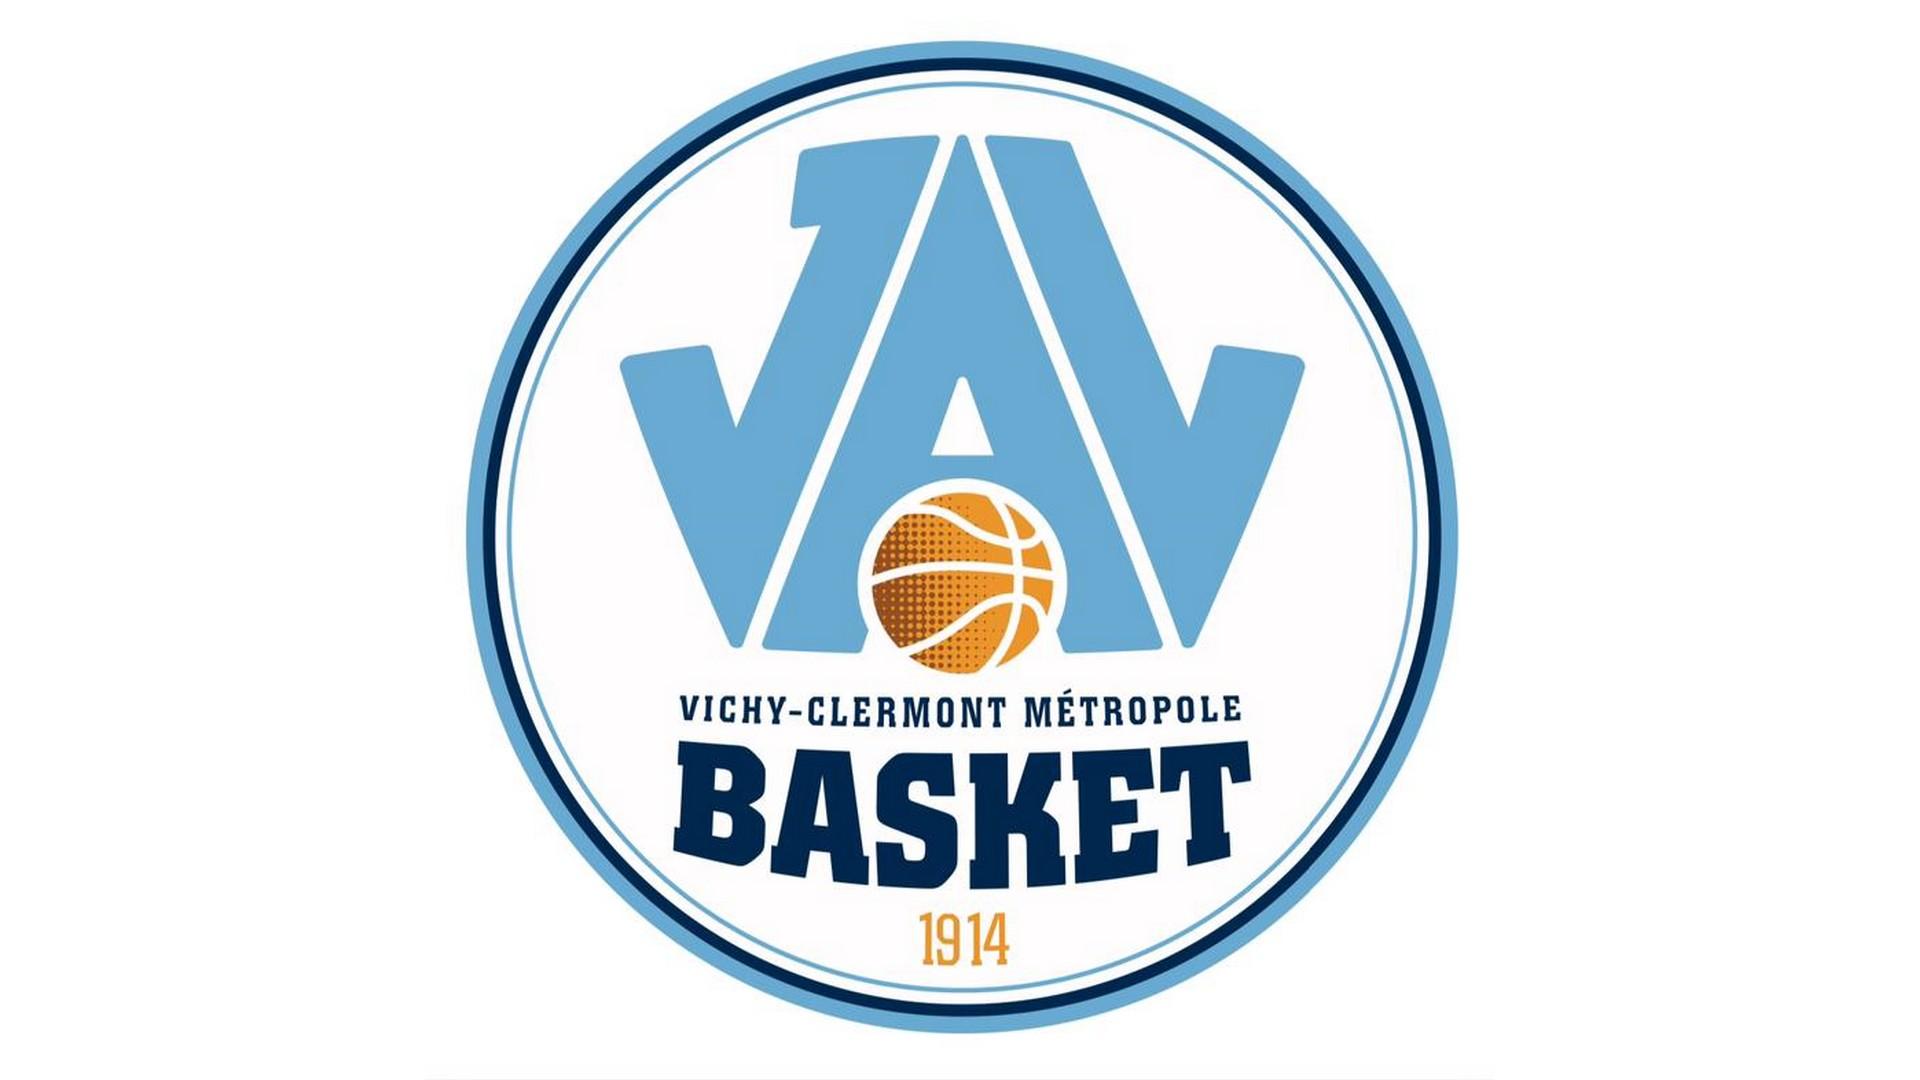 JAV Vichy Clermont Basket (1) Logo